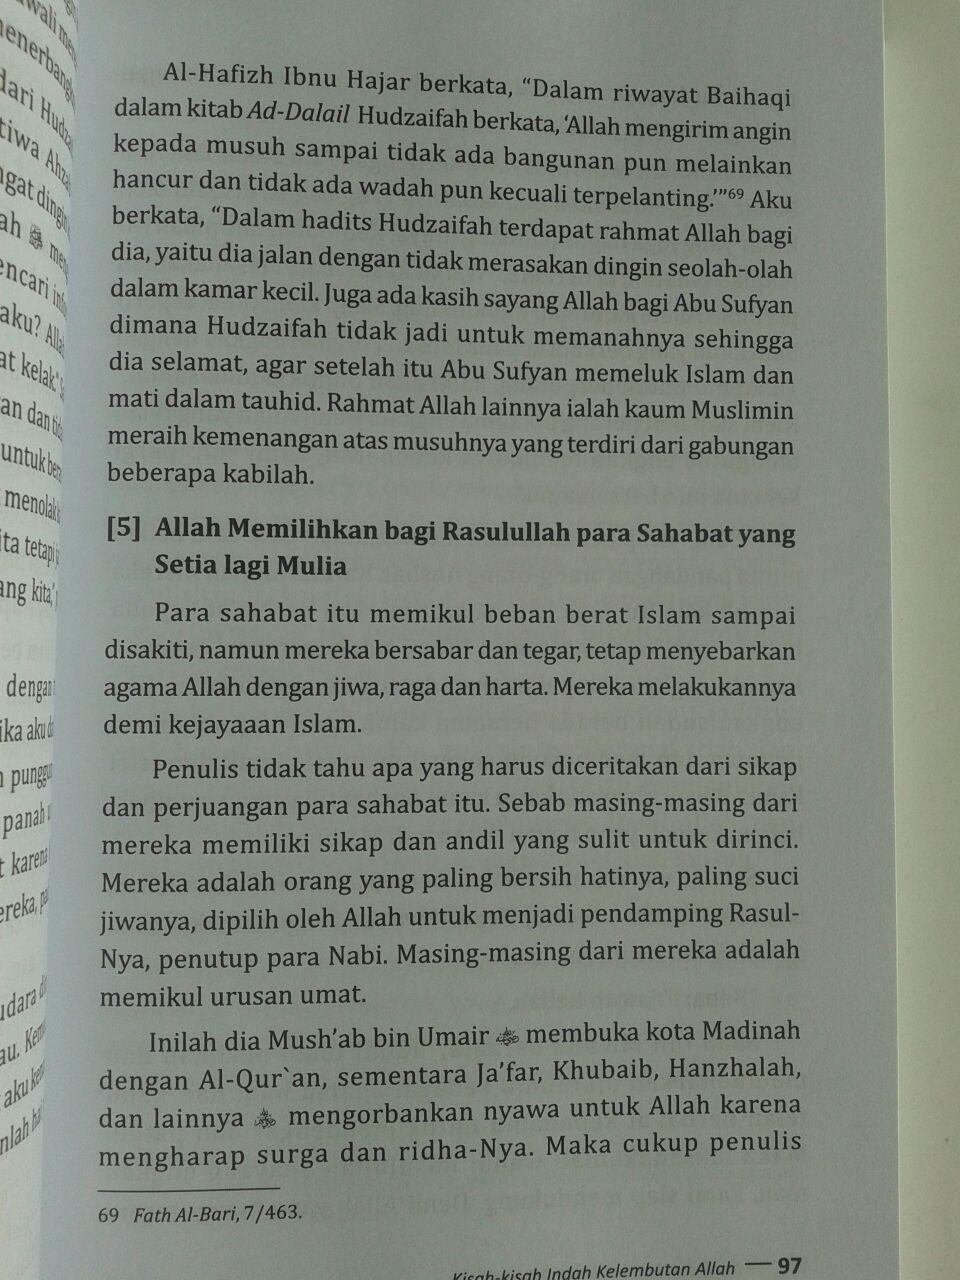 Buku Kisah-Kisah Indah Kelembutan Allah Pustaka Al-Kautsar Sayyid Uthwah isi 2